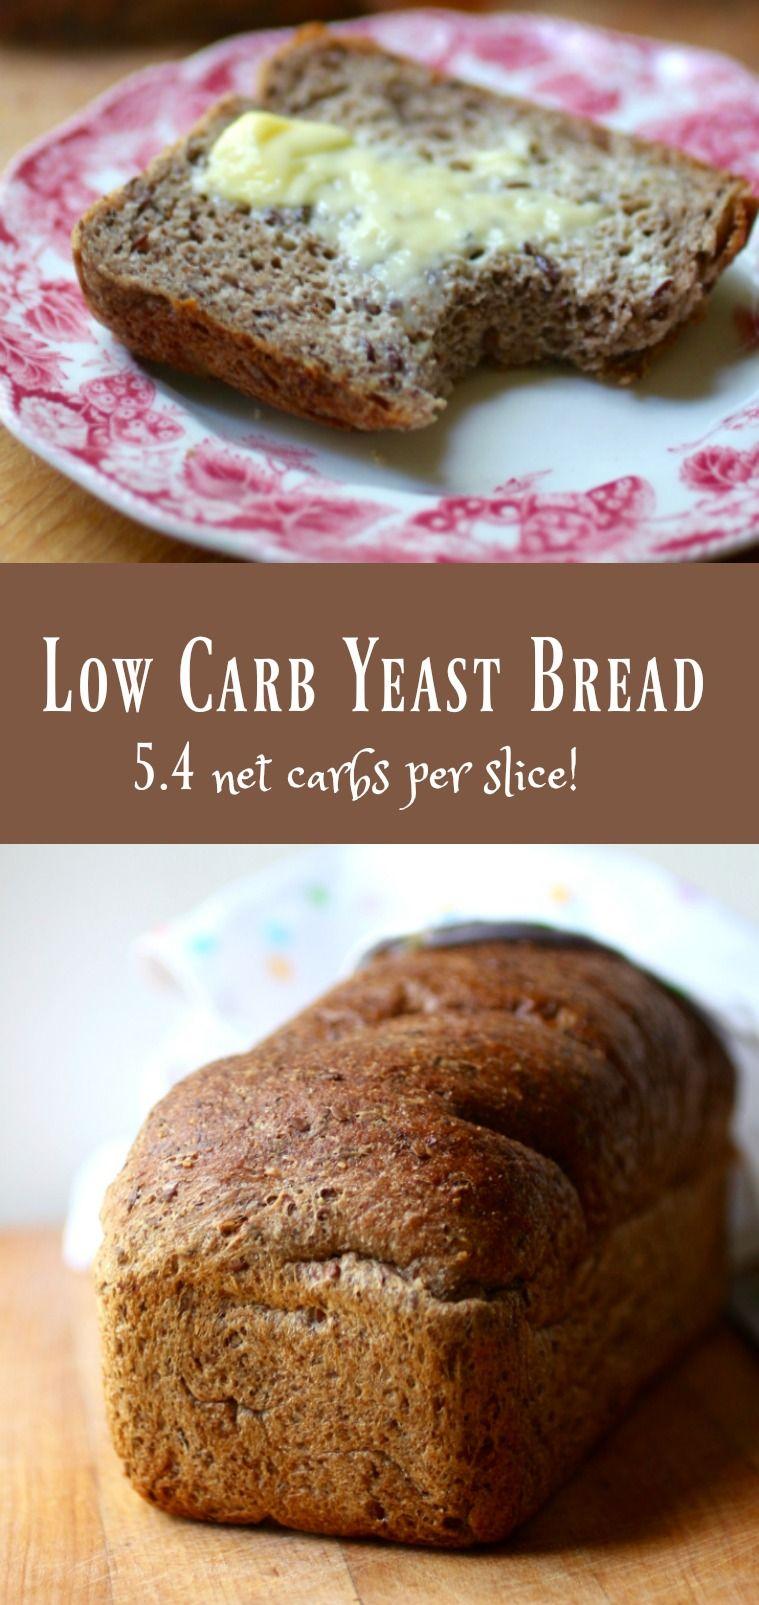 Low Carb Yeast Bread: Keto Sandwich Bread | Recipe | I Can ...